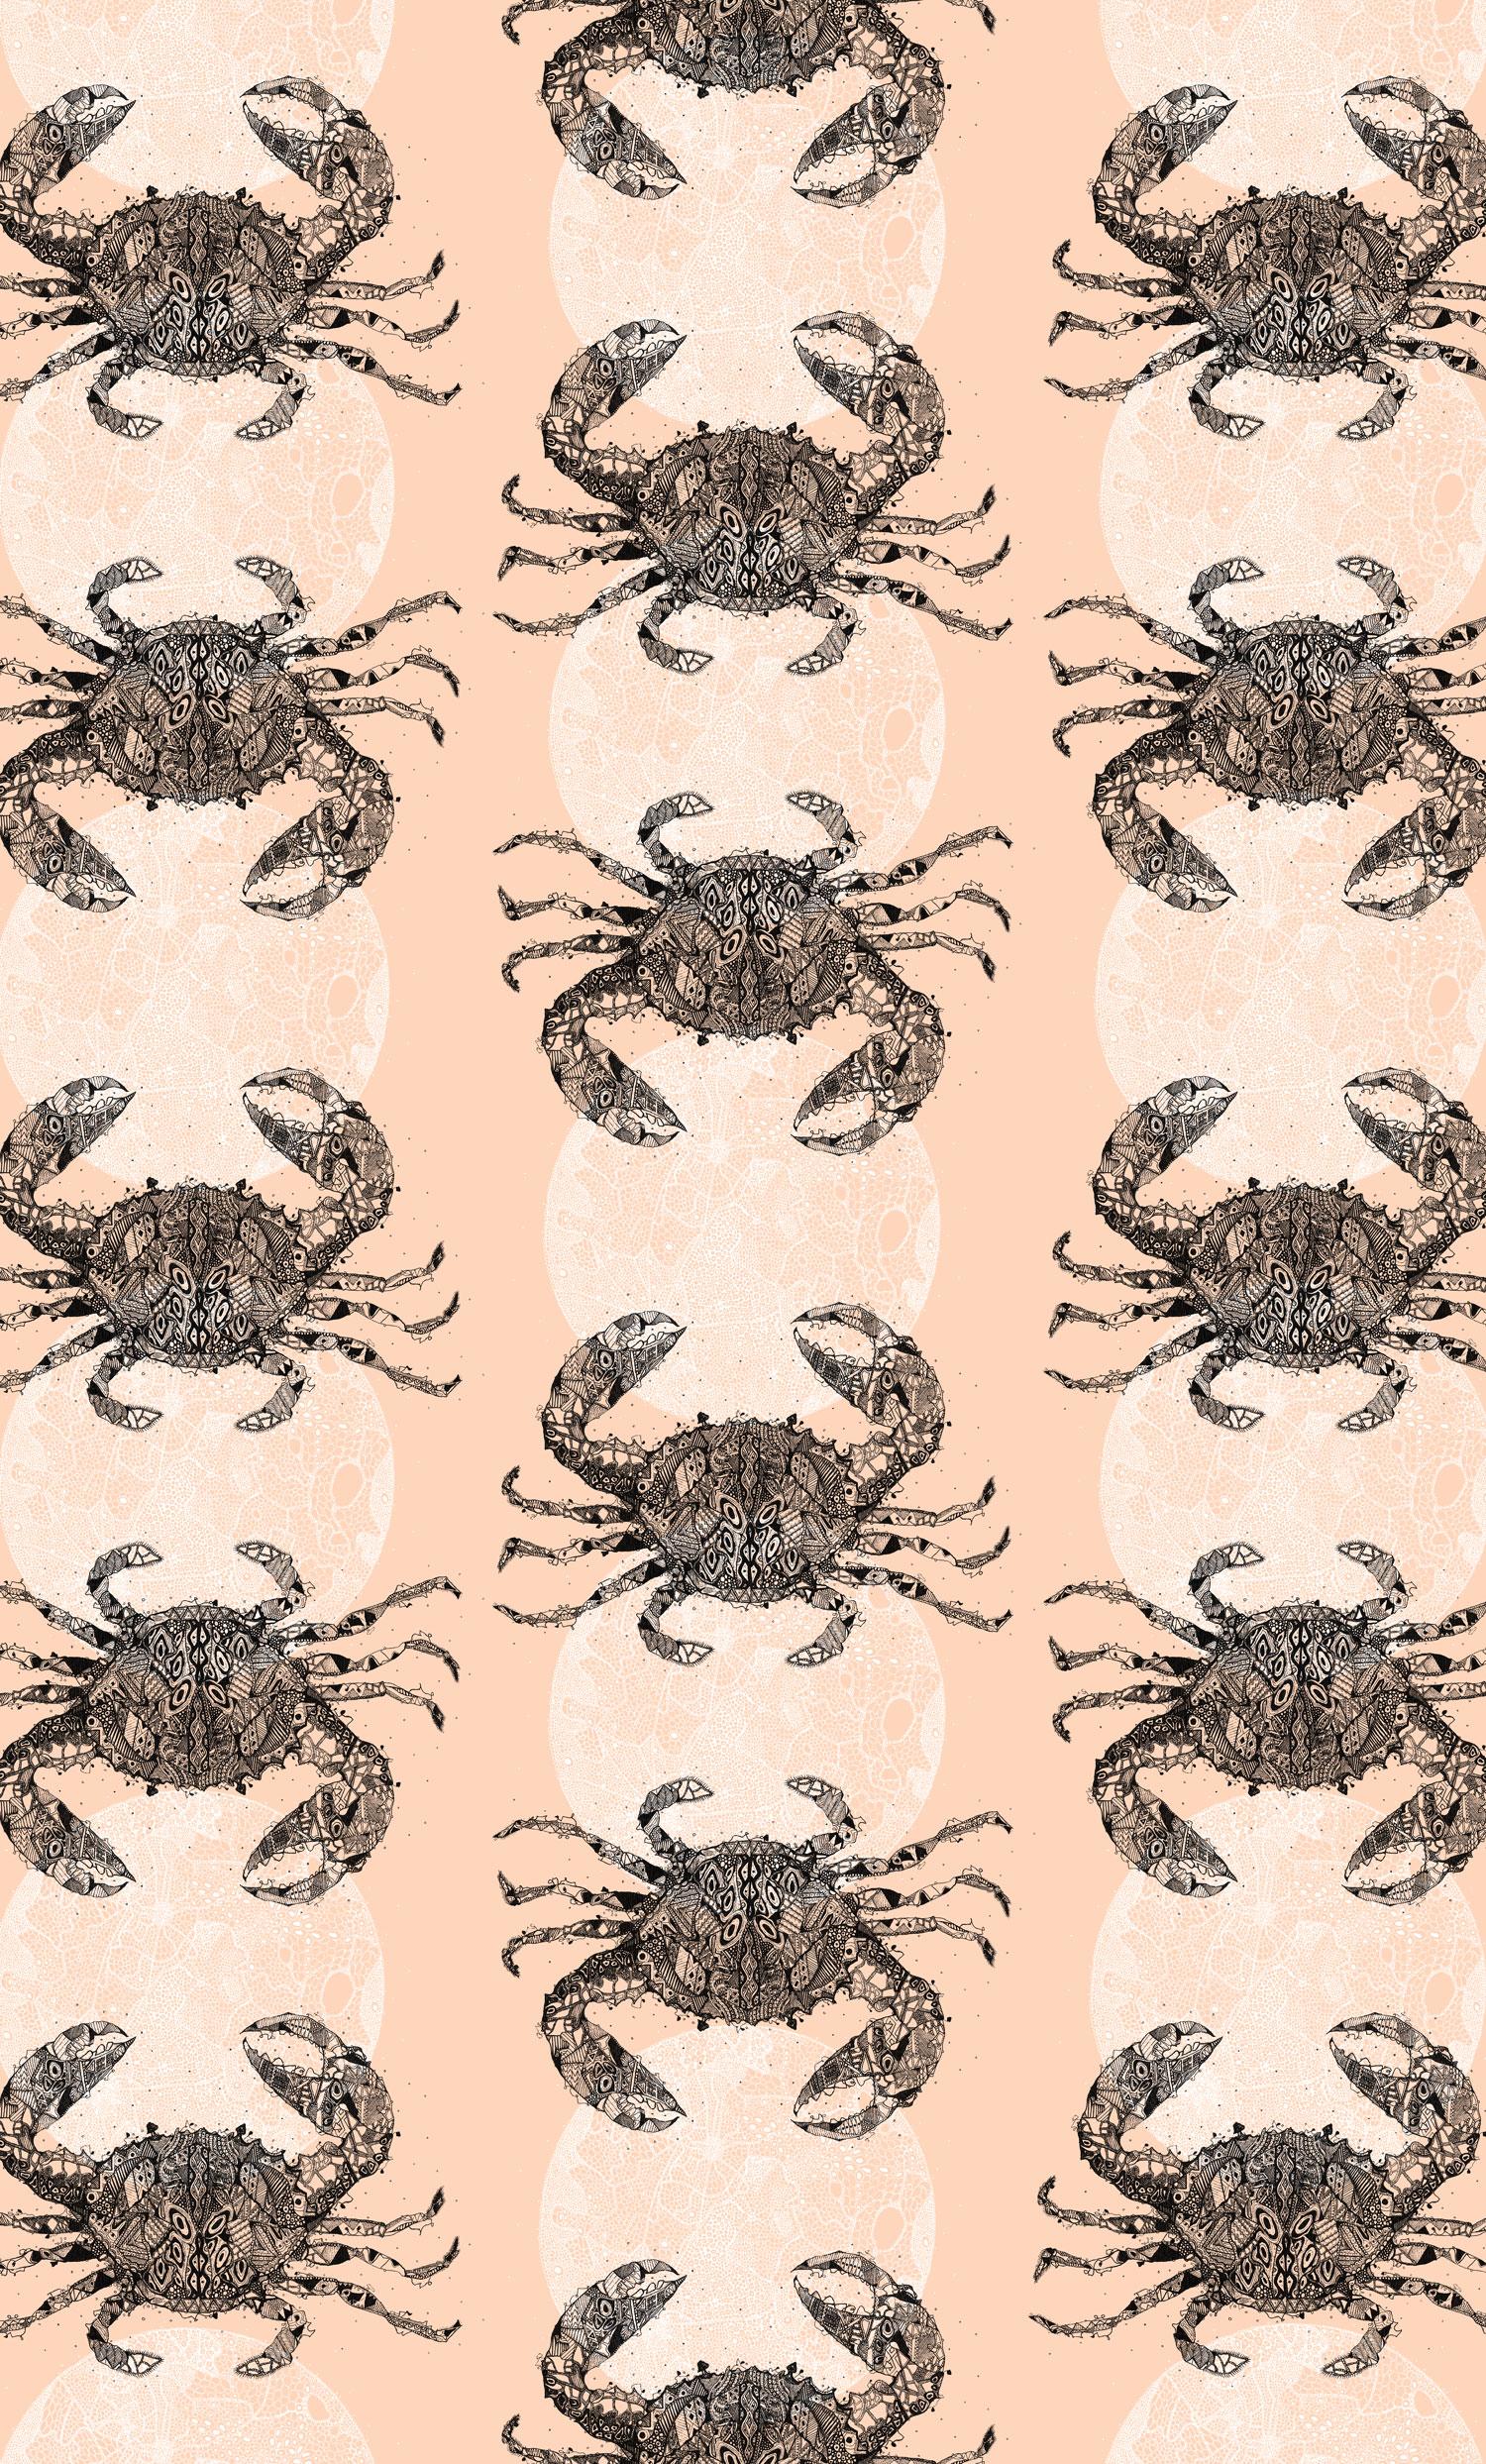 crab_wallpaper_pinkwhiteblack.jpg